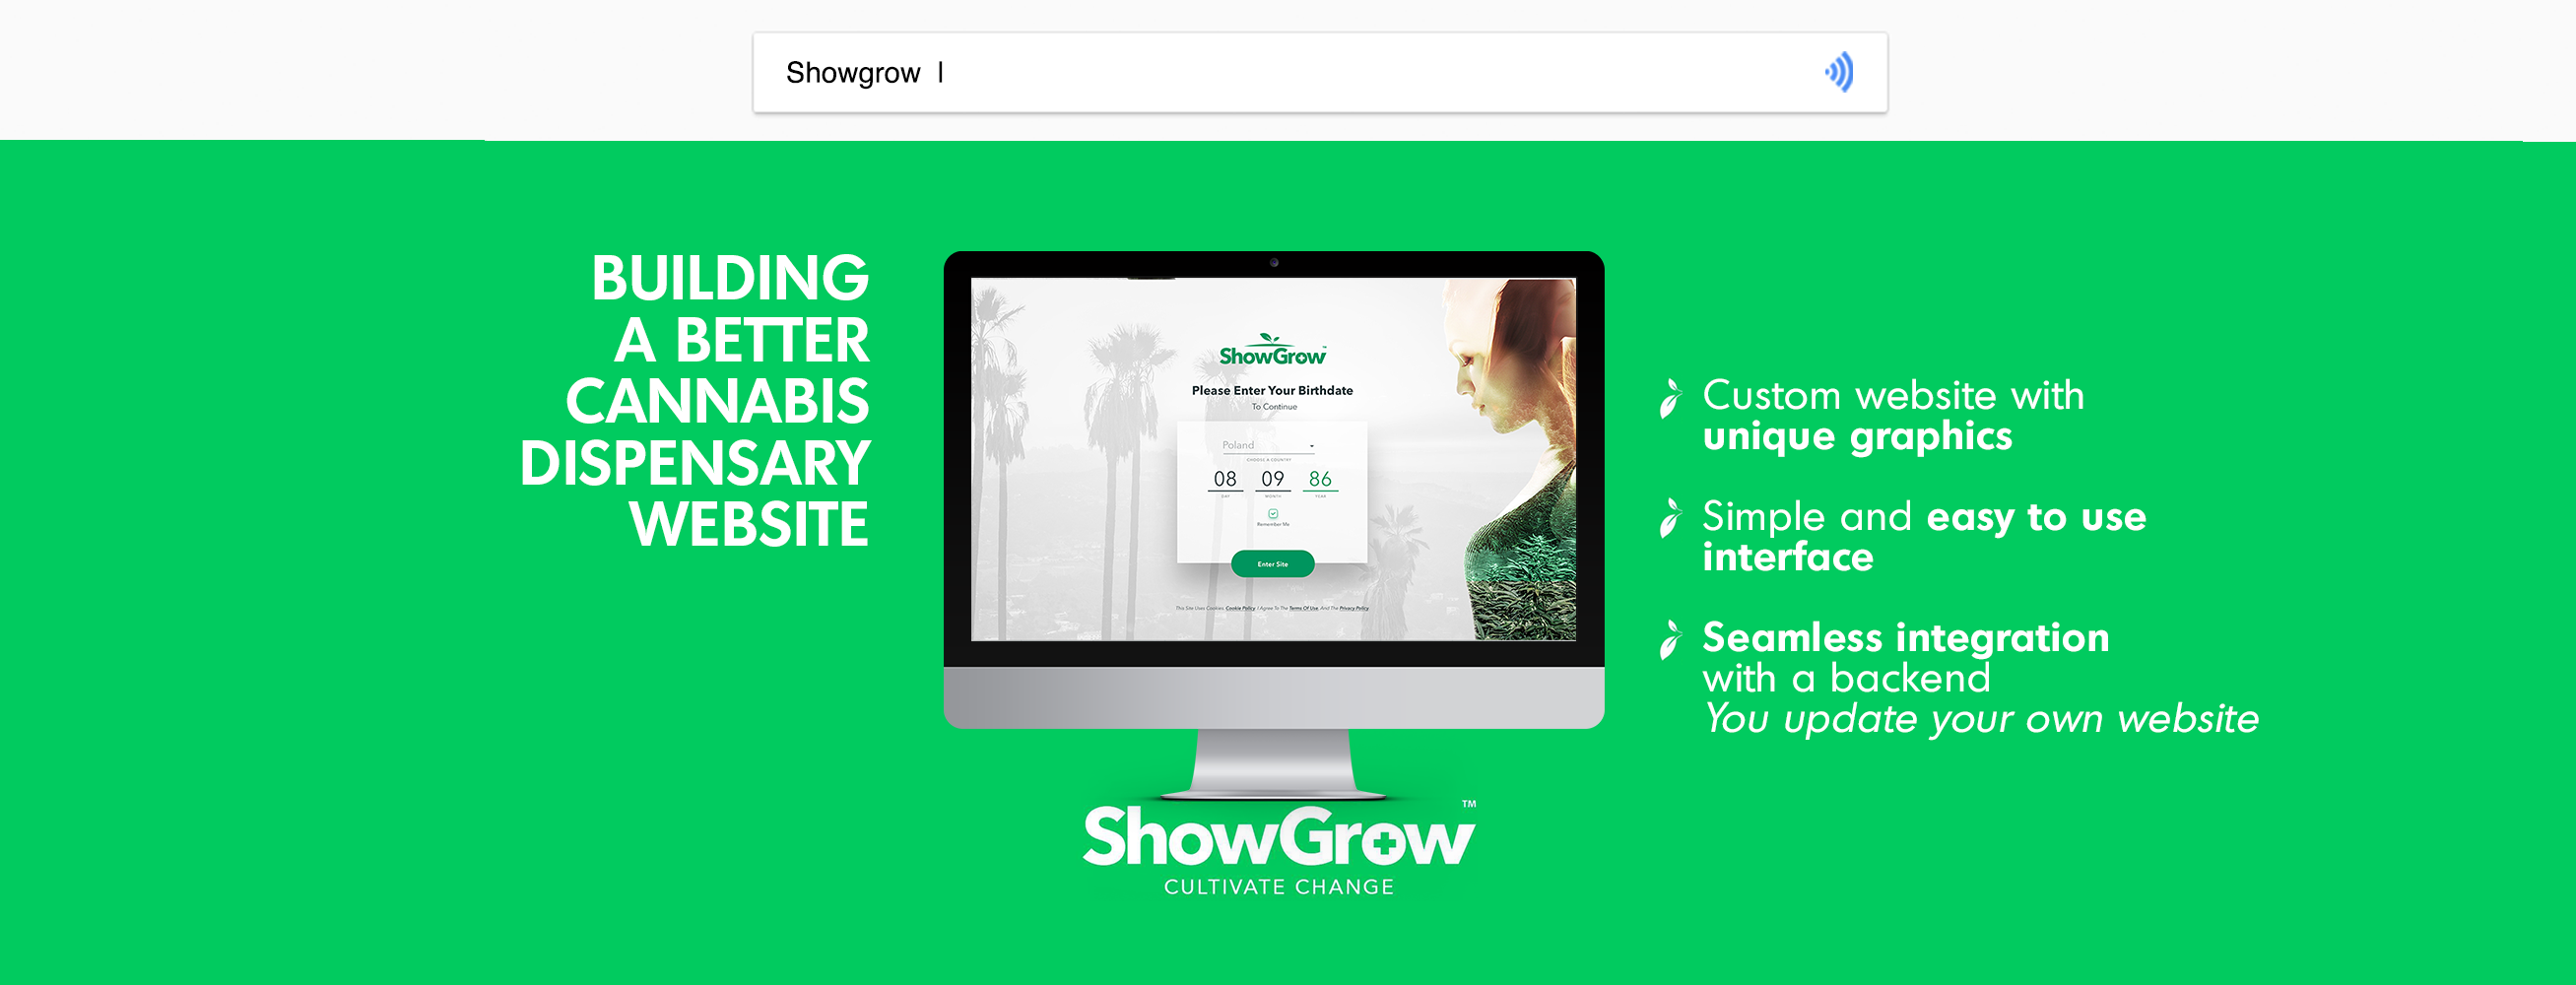 webdevelopment-showgrow - hms